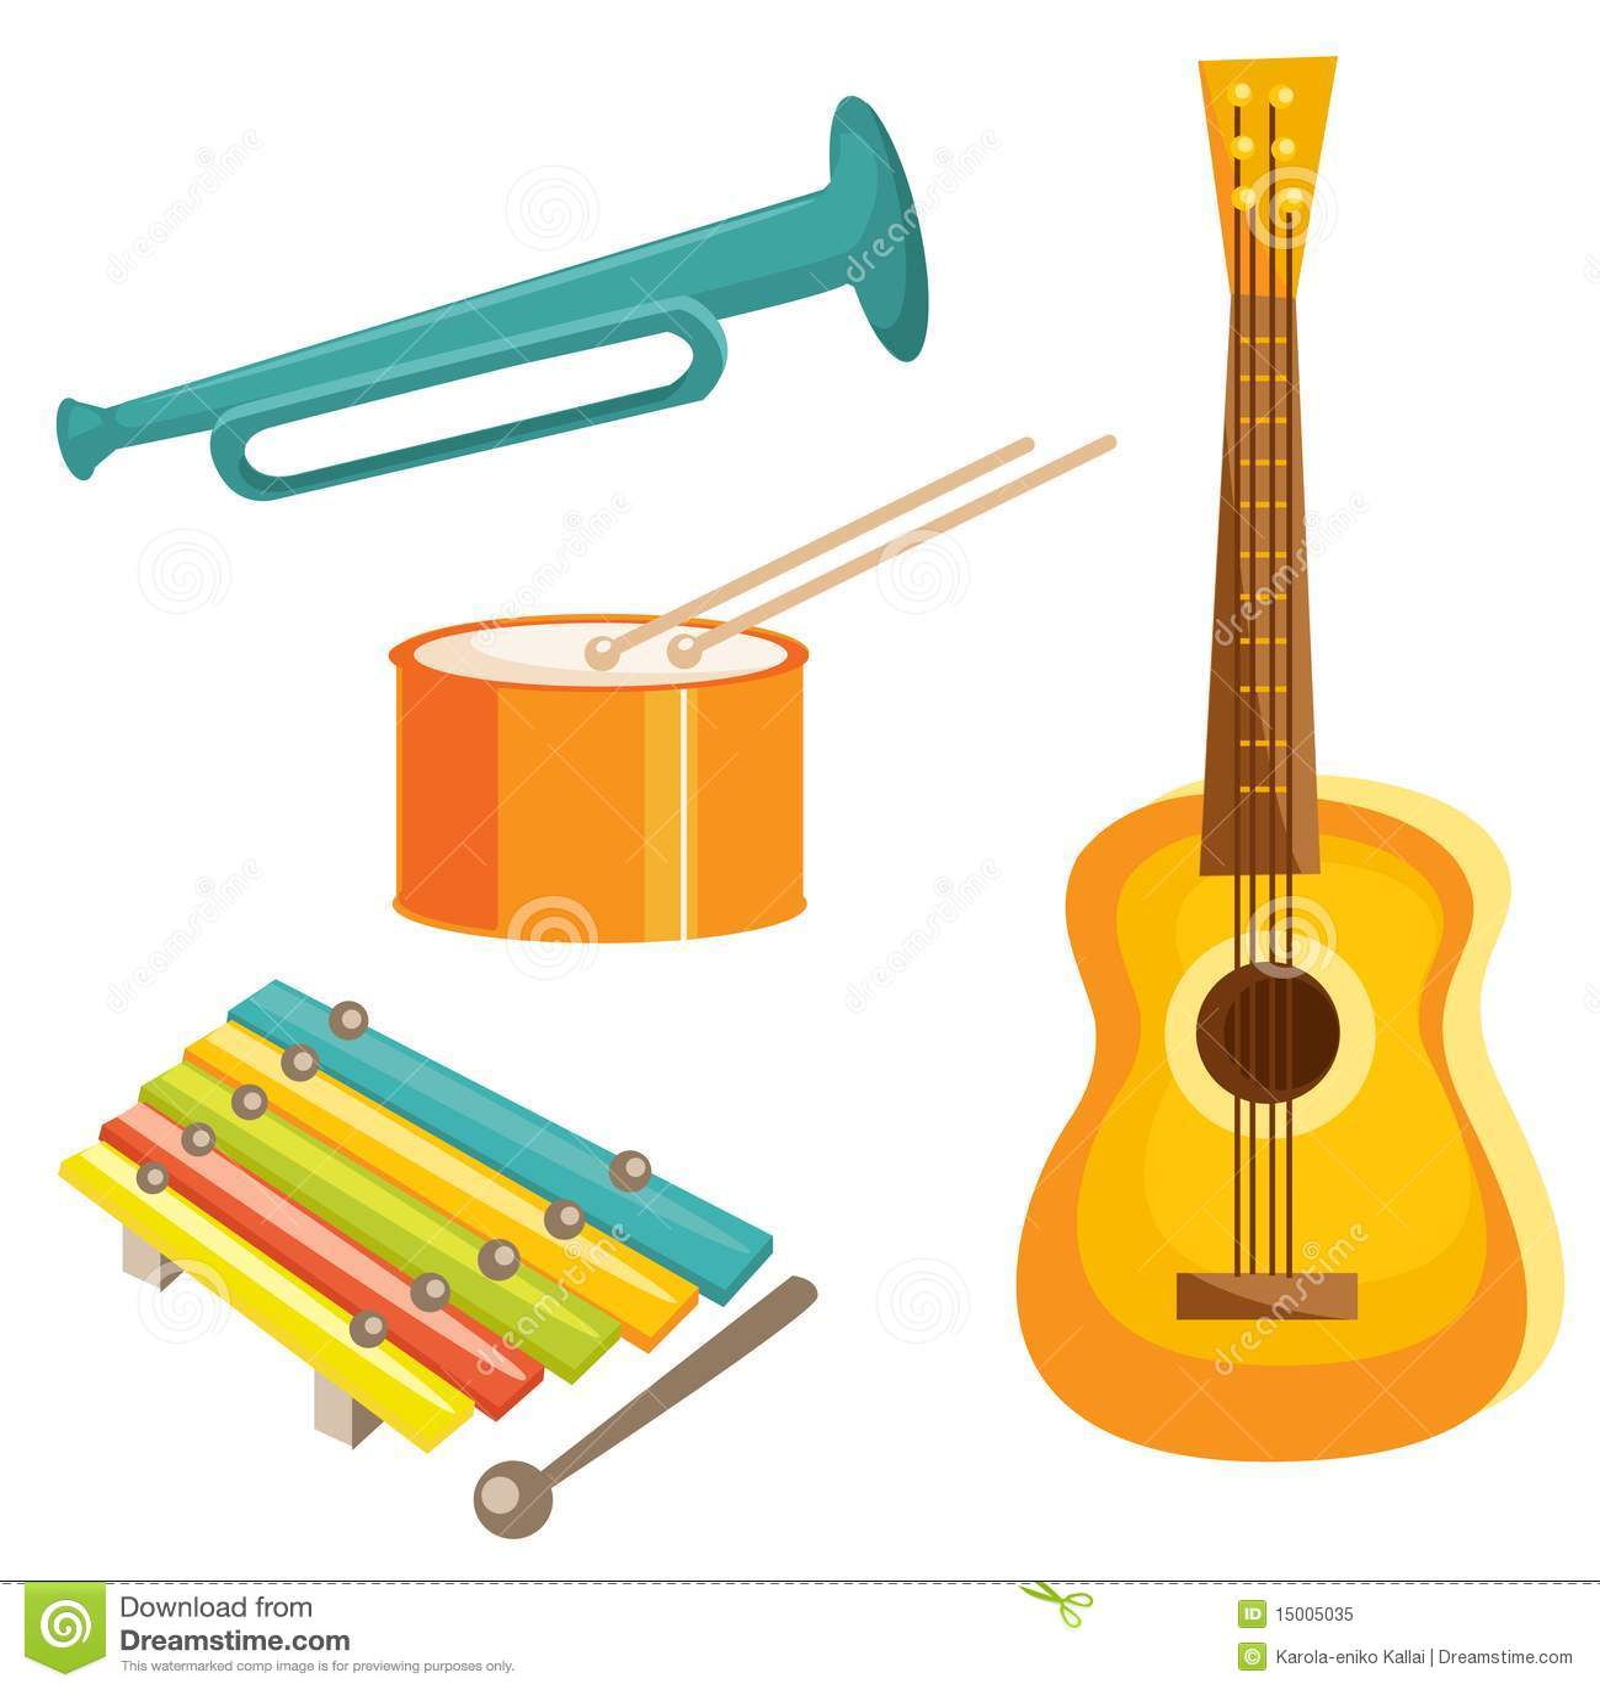 Cartoon Musical Instruments Royalty Free Stock Photo - Image: 15005035